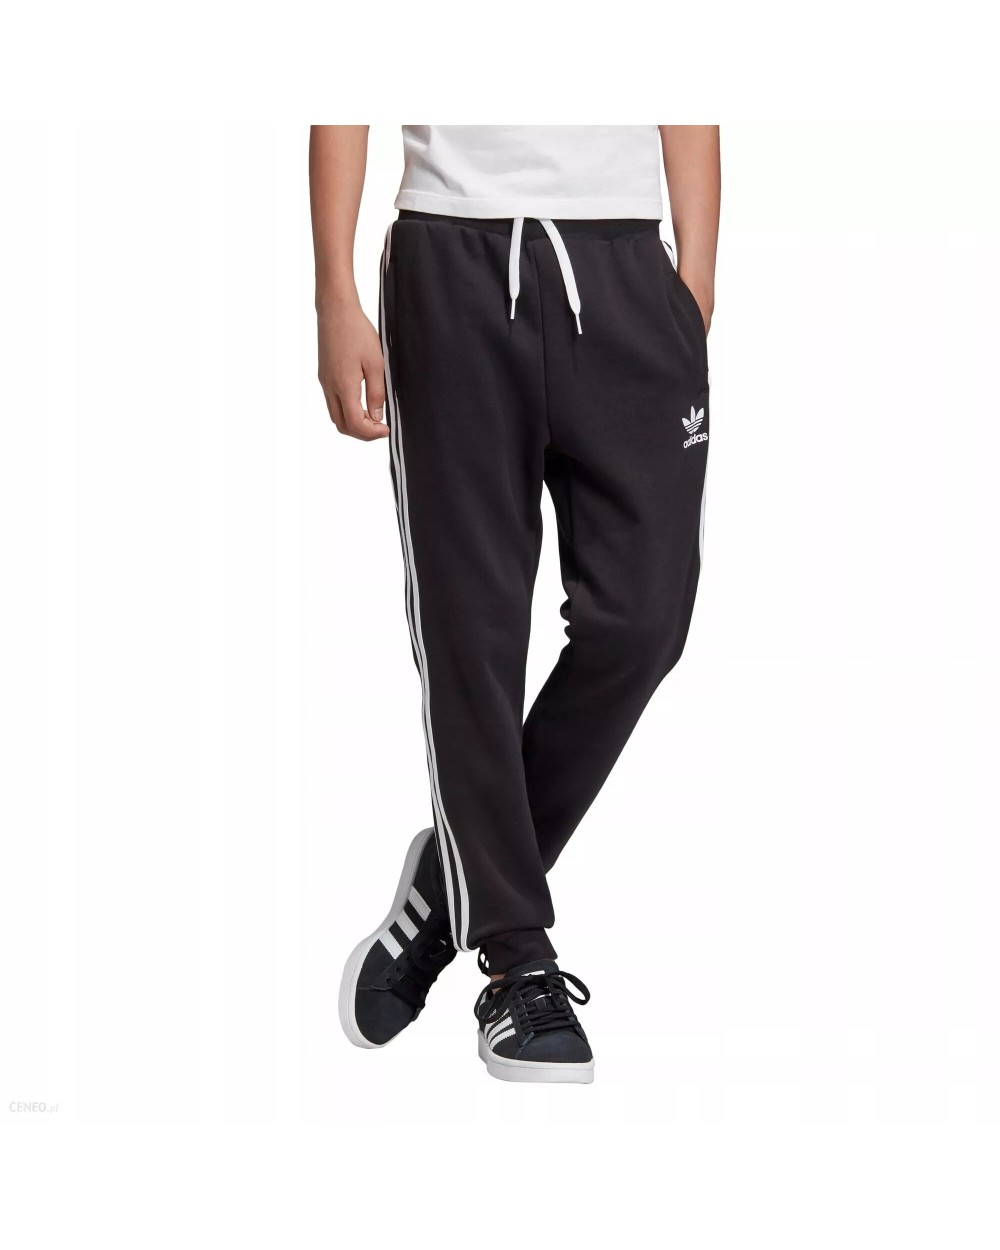 adidas pantalon 3 stripes femme